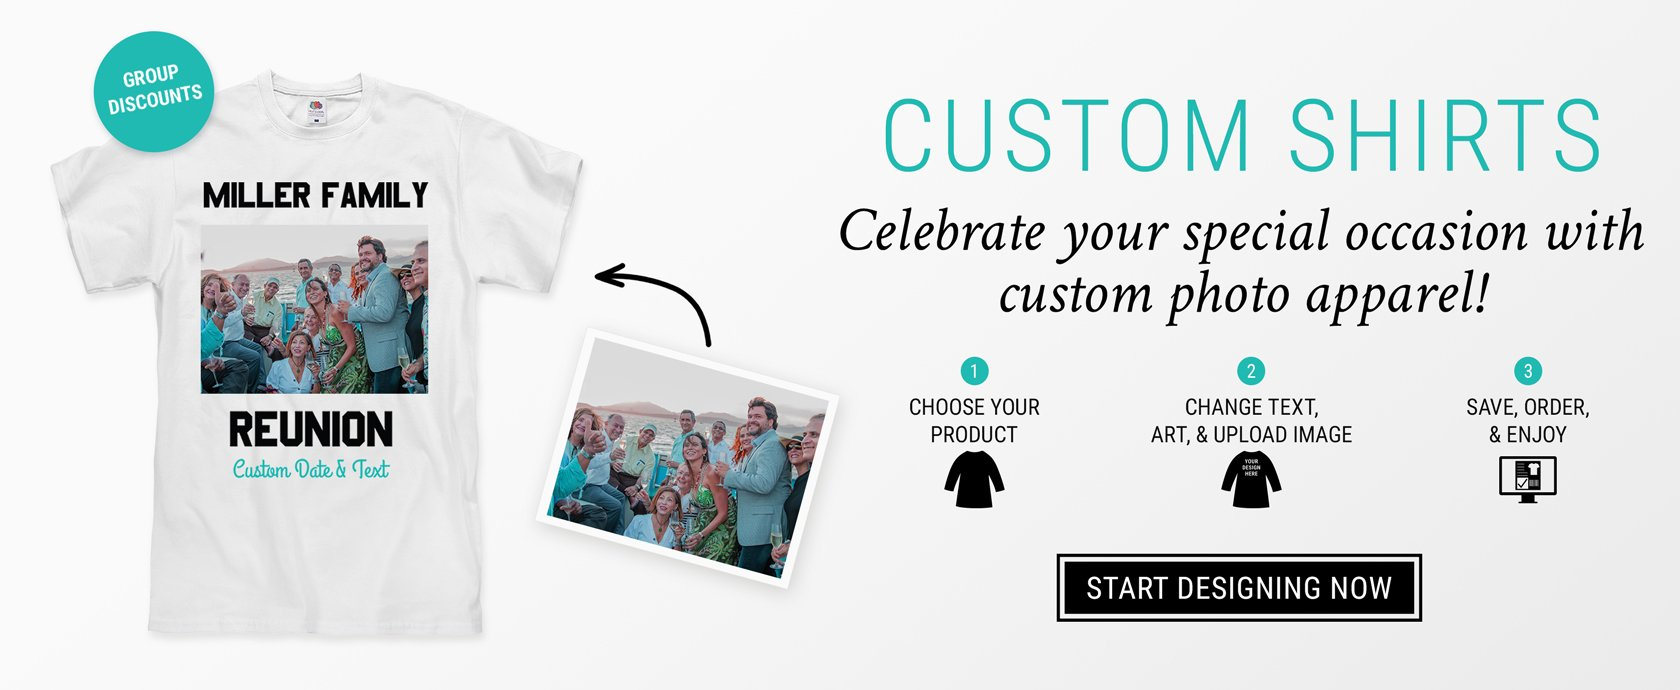 4d6a59f610077 Customized Girl - Custom Shirts, Tanks, Undies, & More